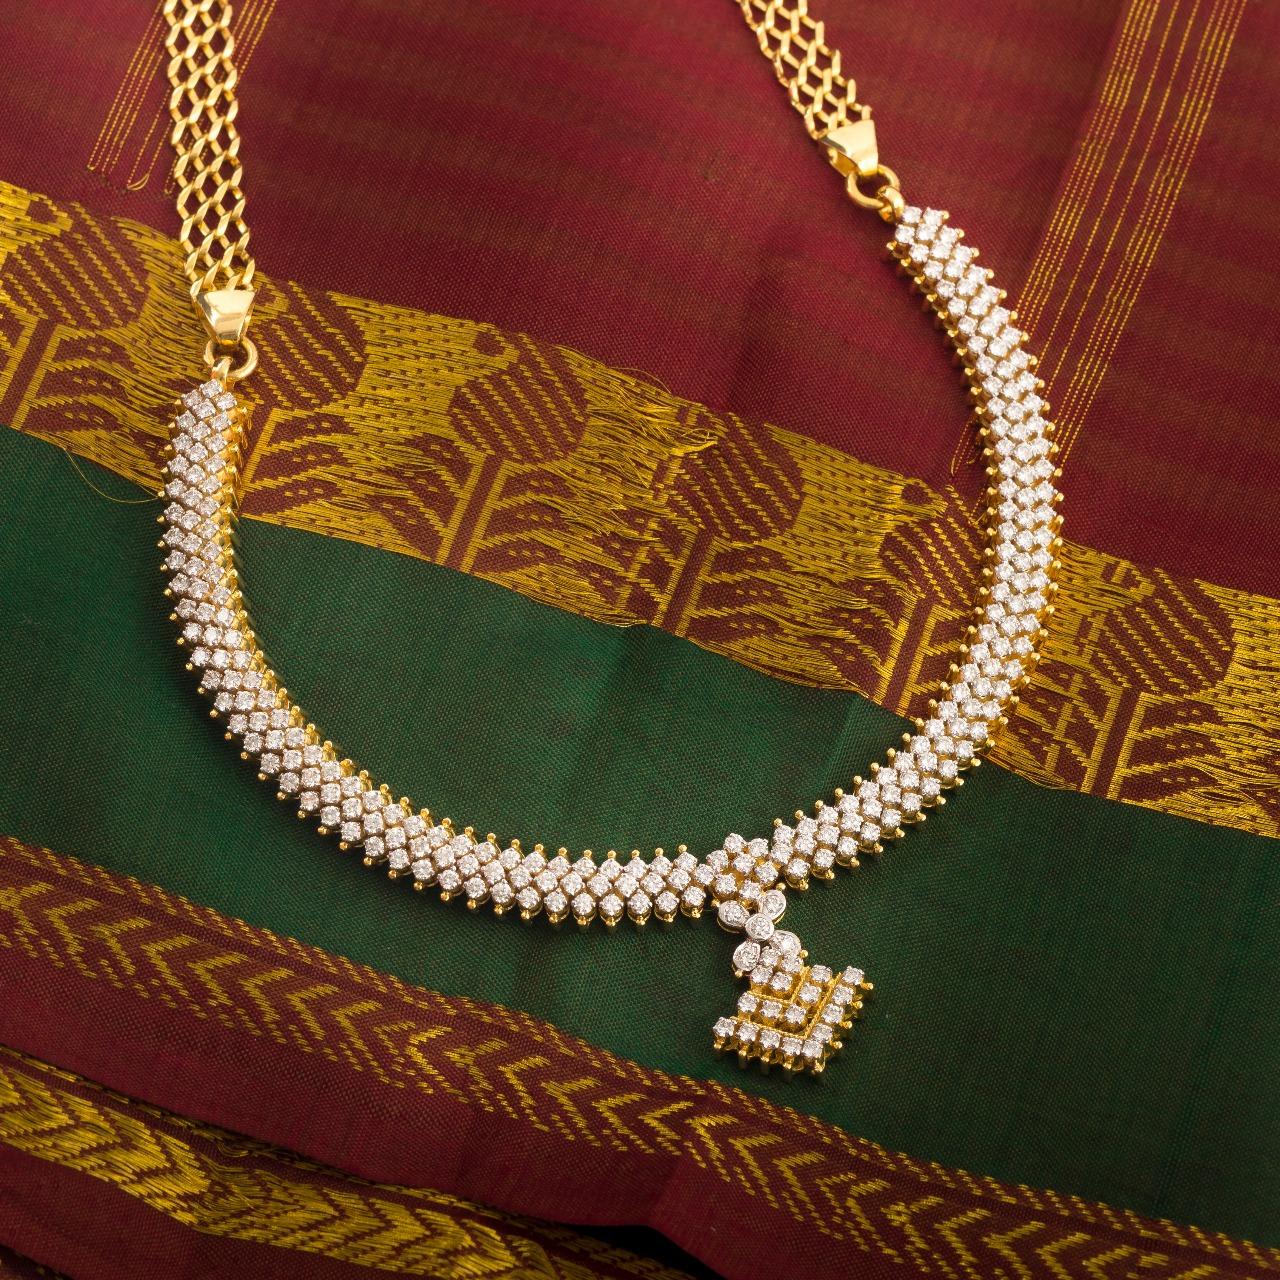 diamond-necklace-designs-2019 (3)